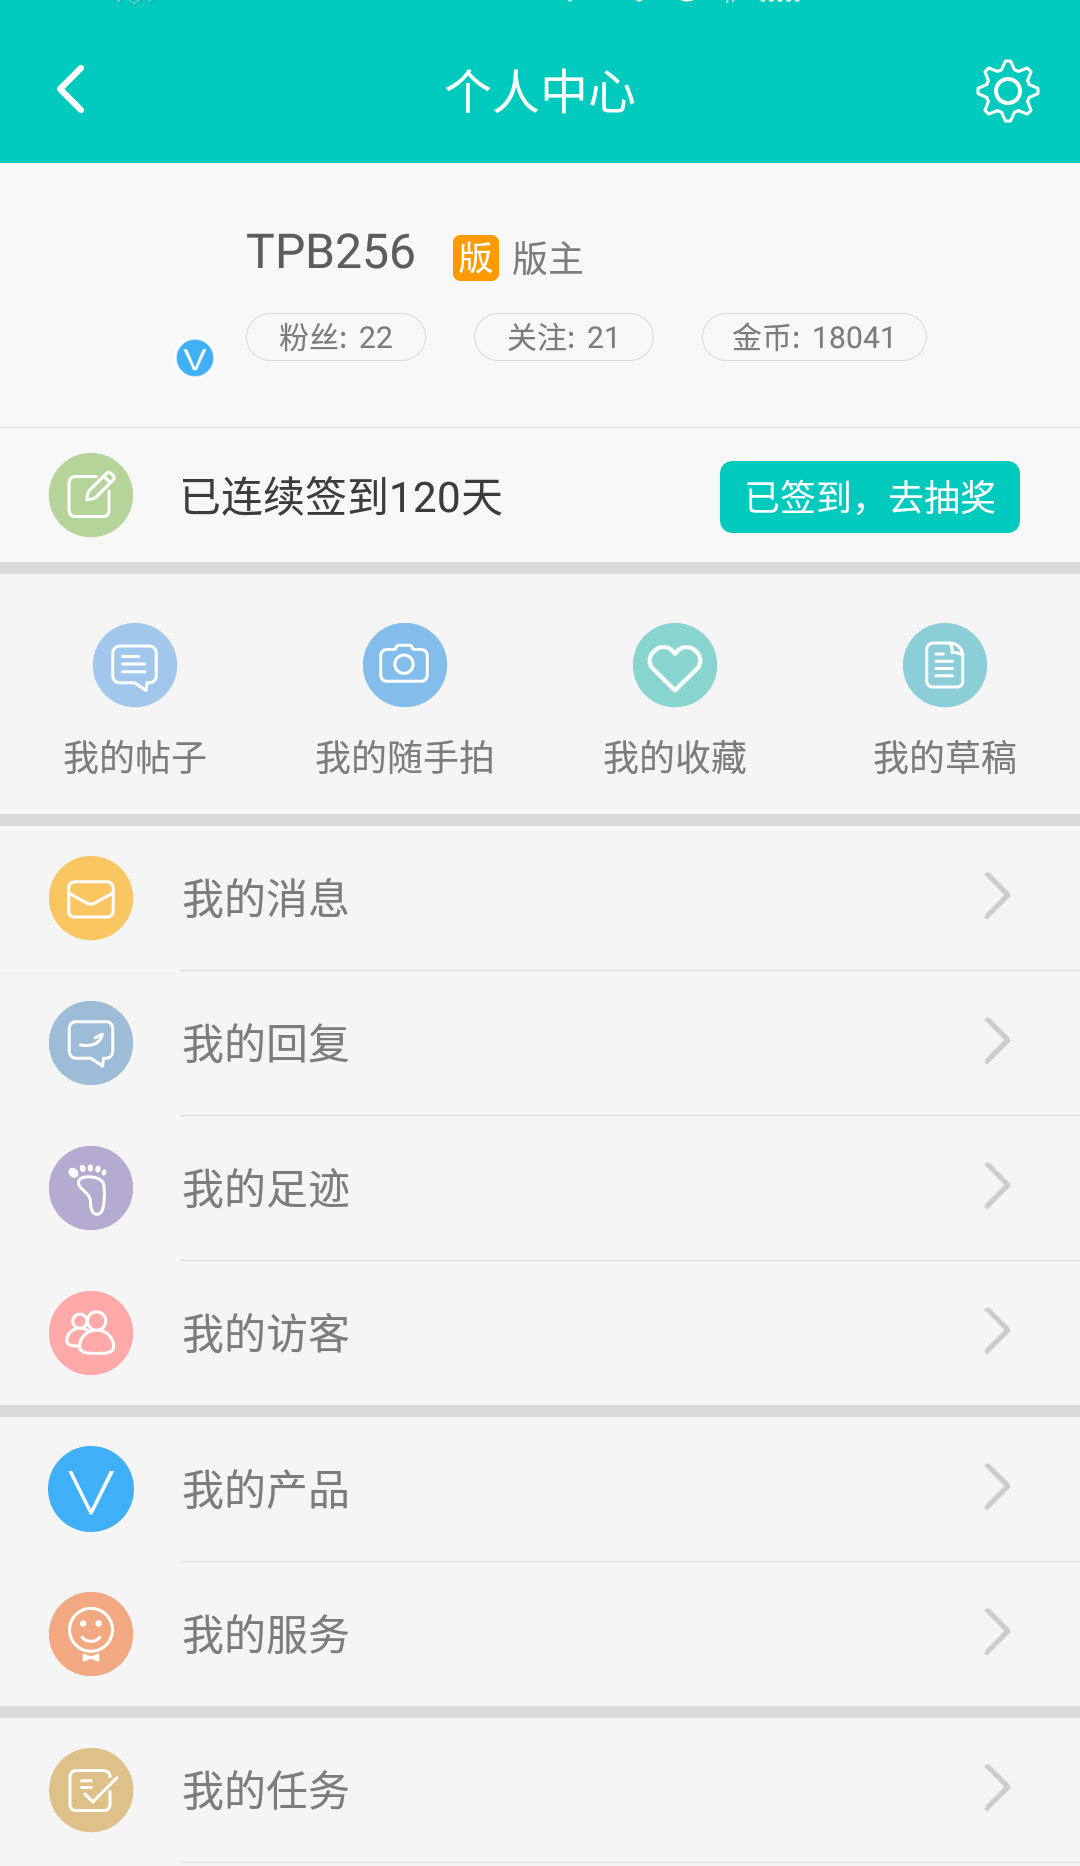 Screenshot_2018-07-13-11-53-52.png